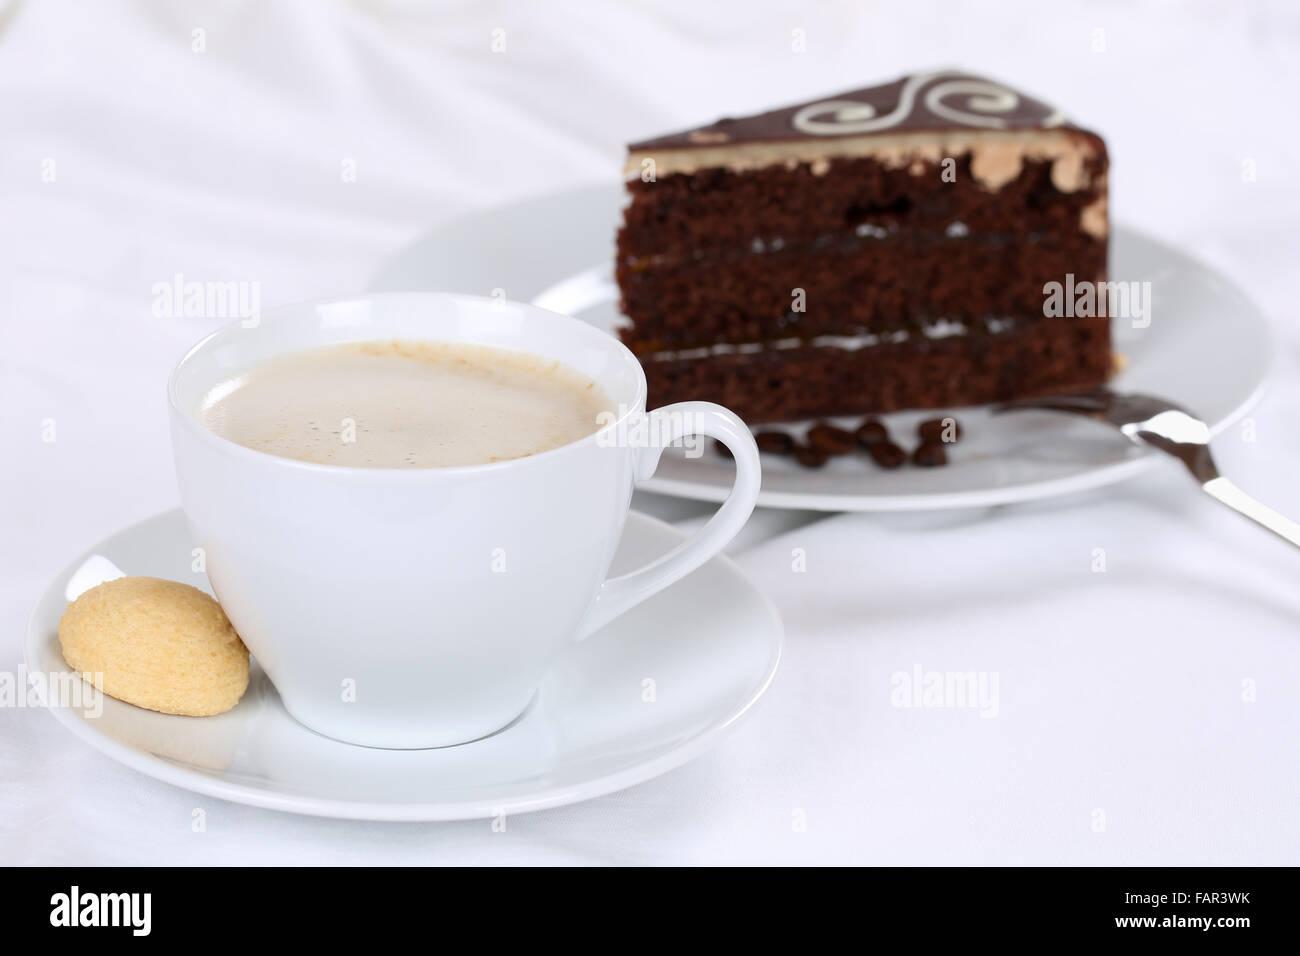 Kaffee und Kuchen Schokolade Torte Süßspeise Gebäck Stockbild